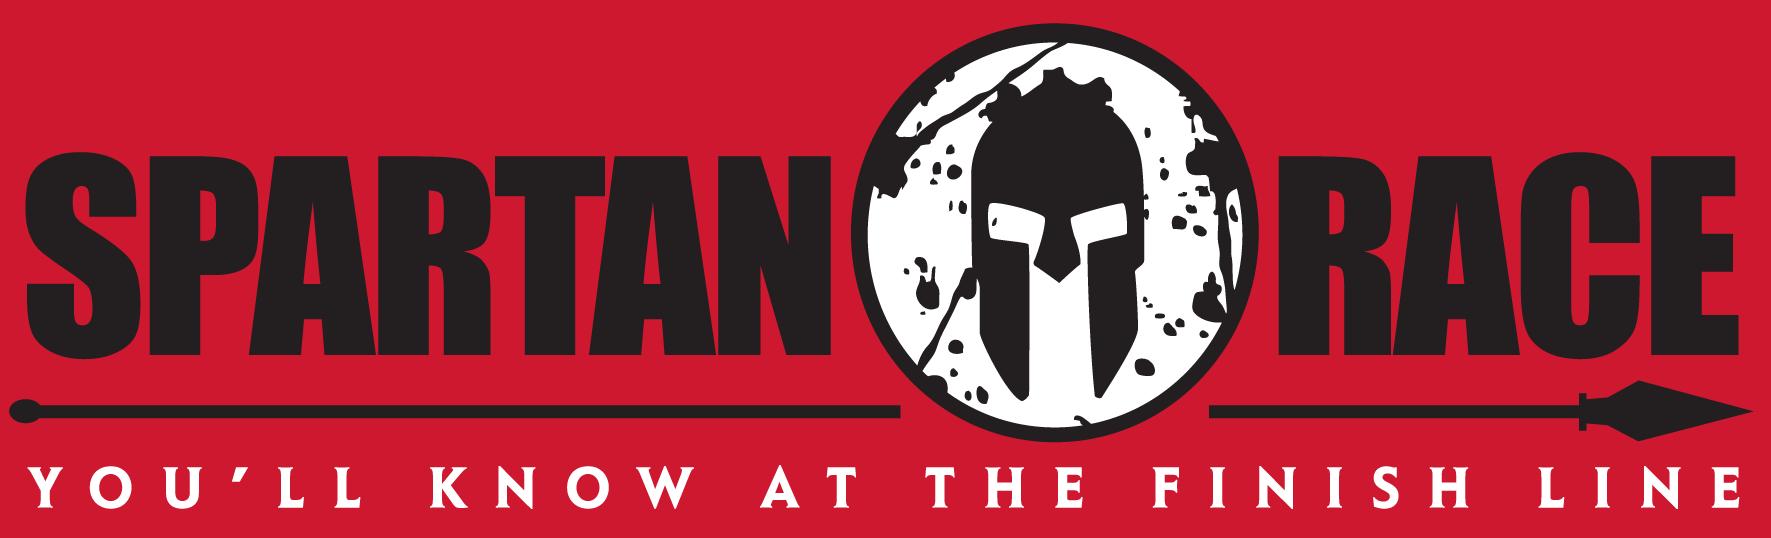 Spartan Race Logo Spartan race 2014 1771x538